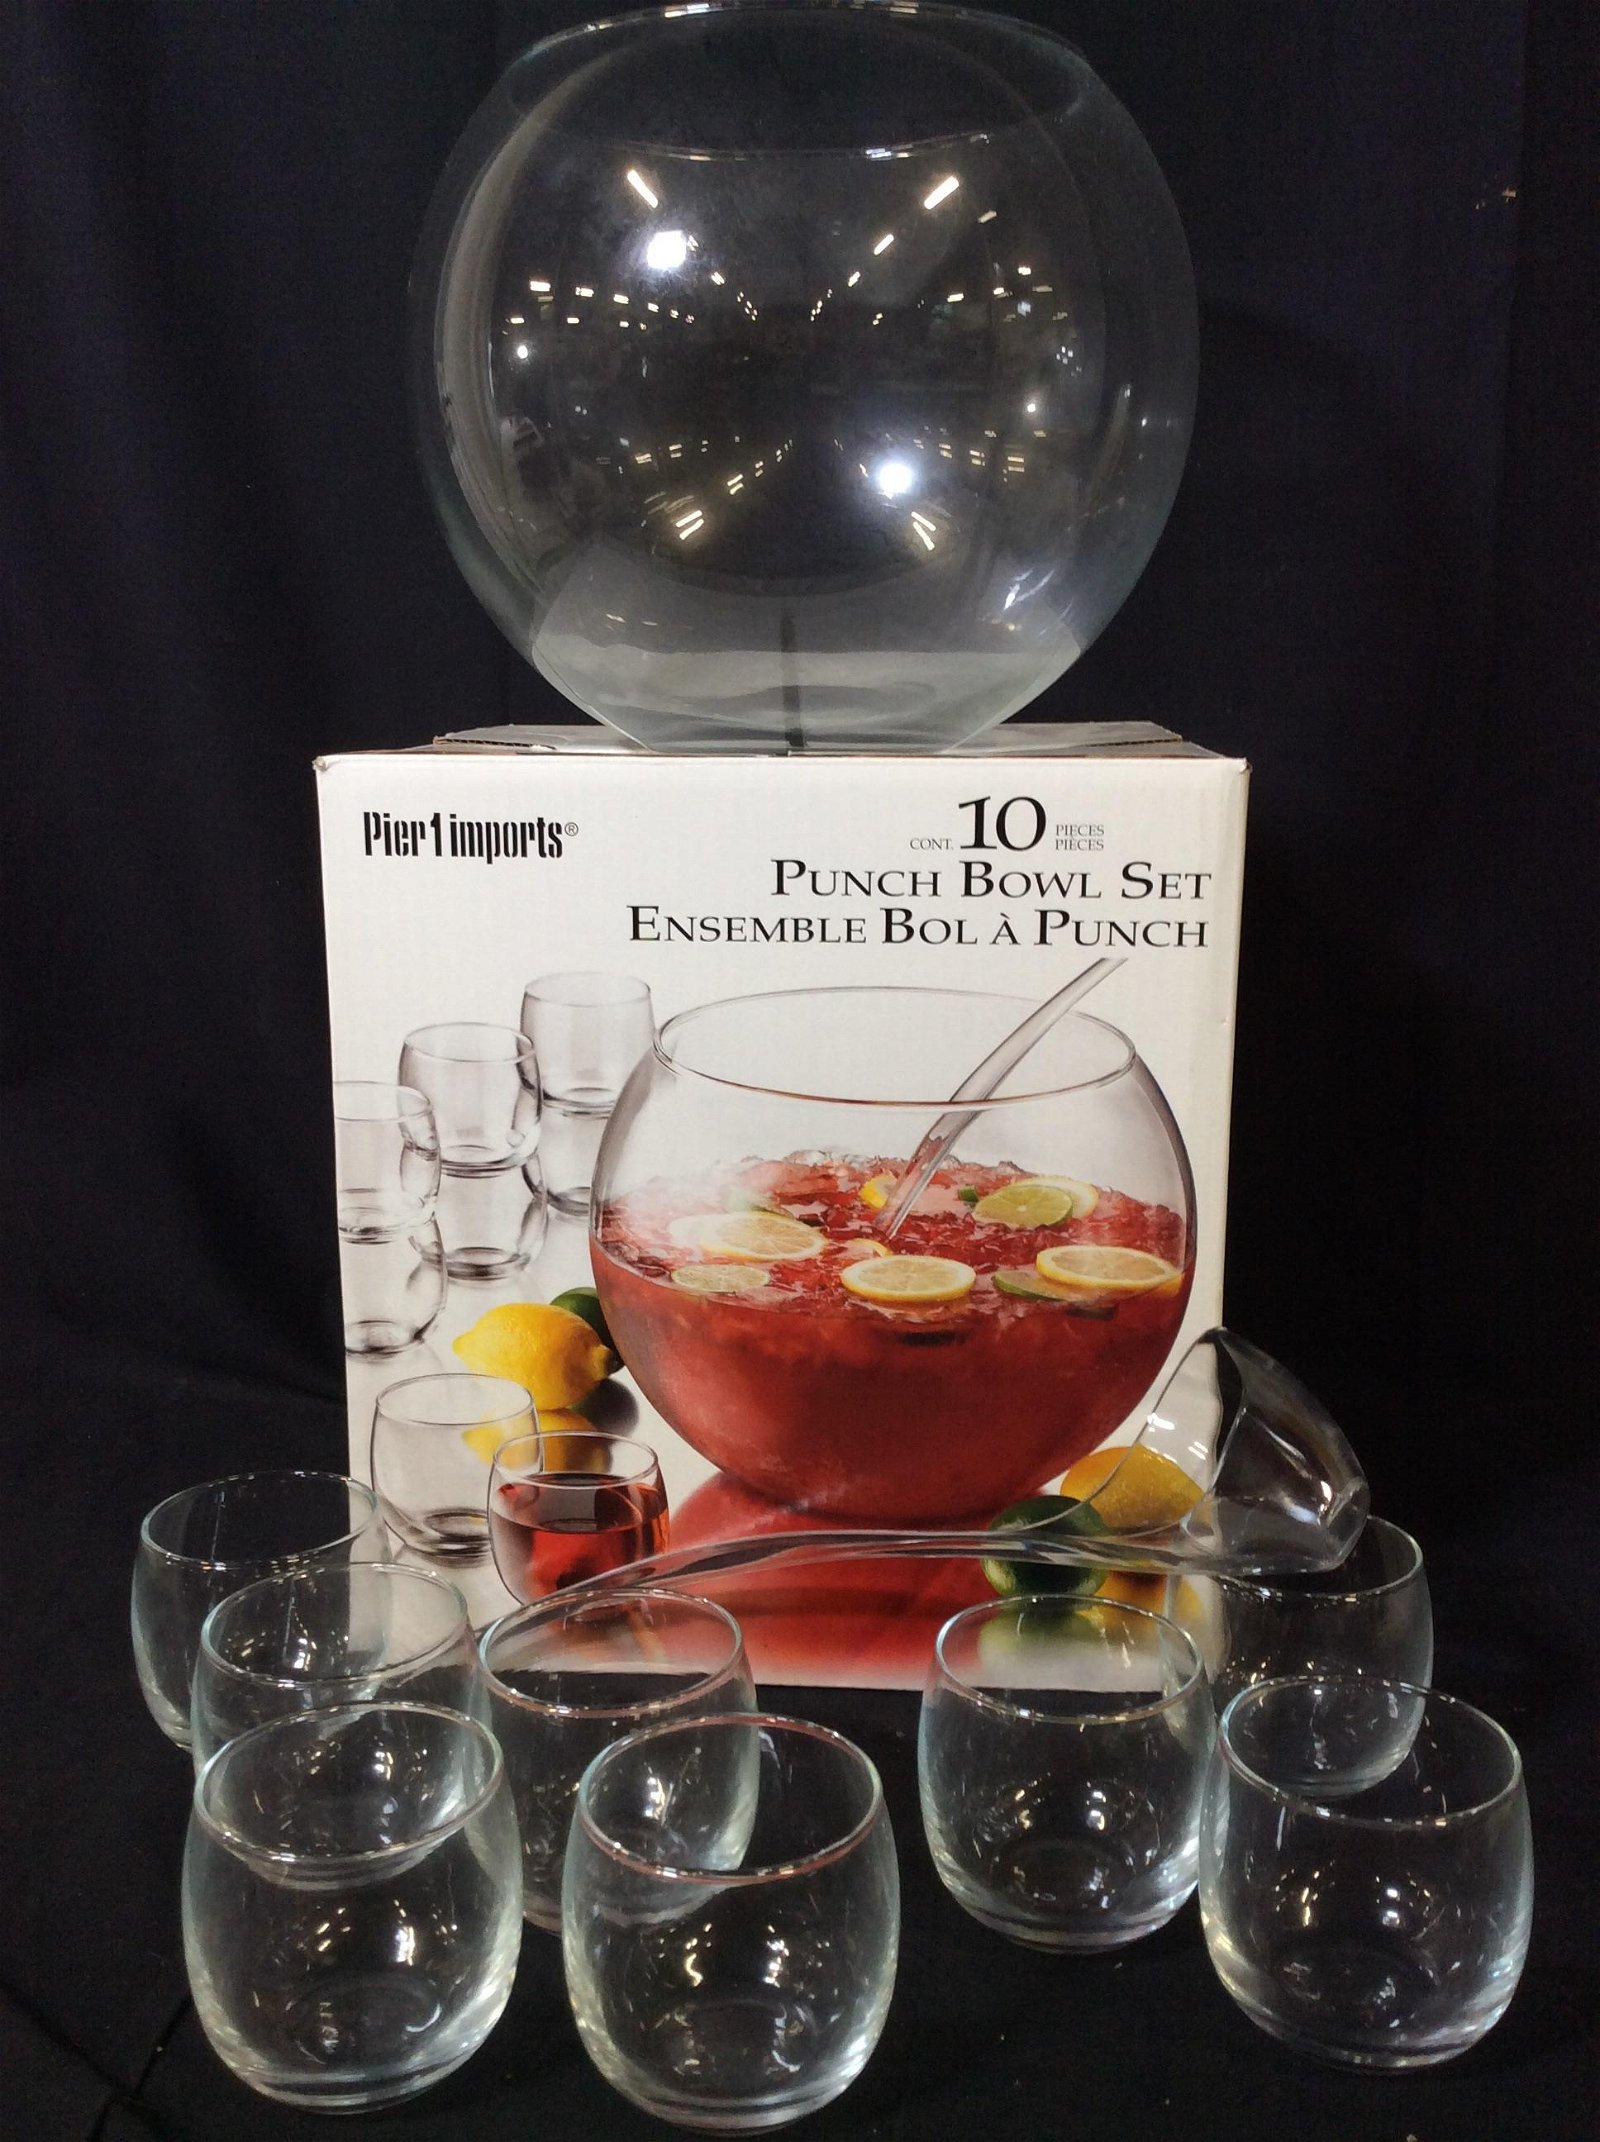 Pier 1 Imports Glass Punch Bowl 10 pc Set, Org Box